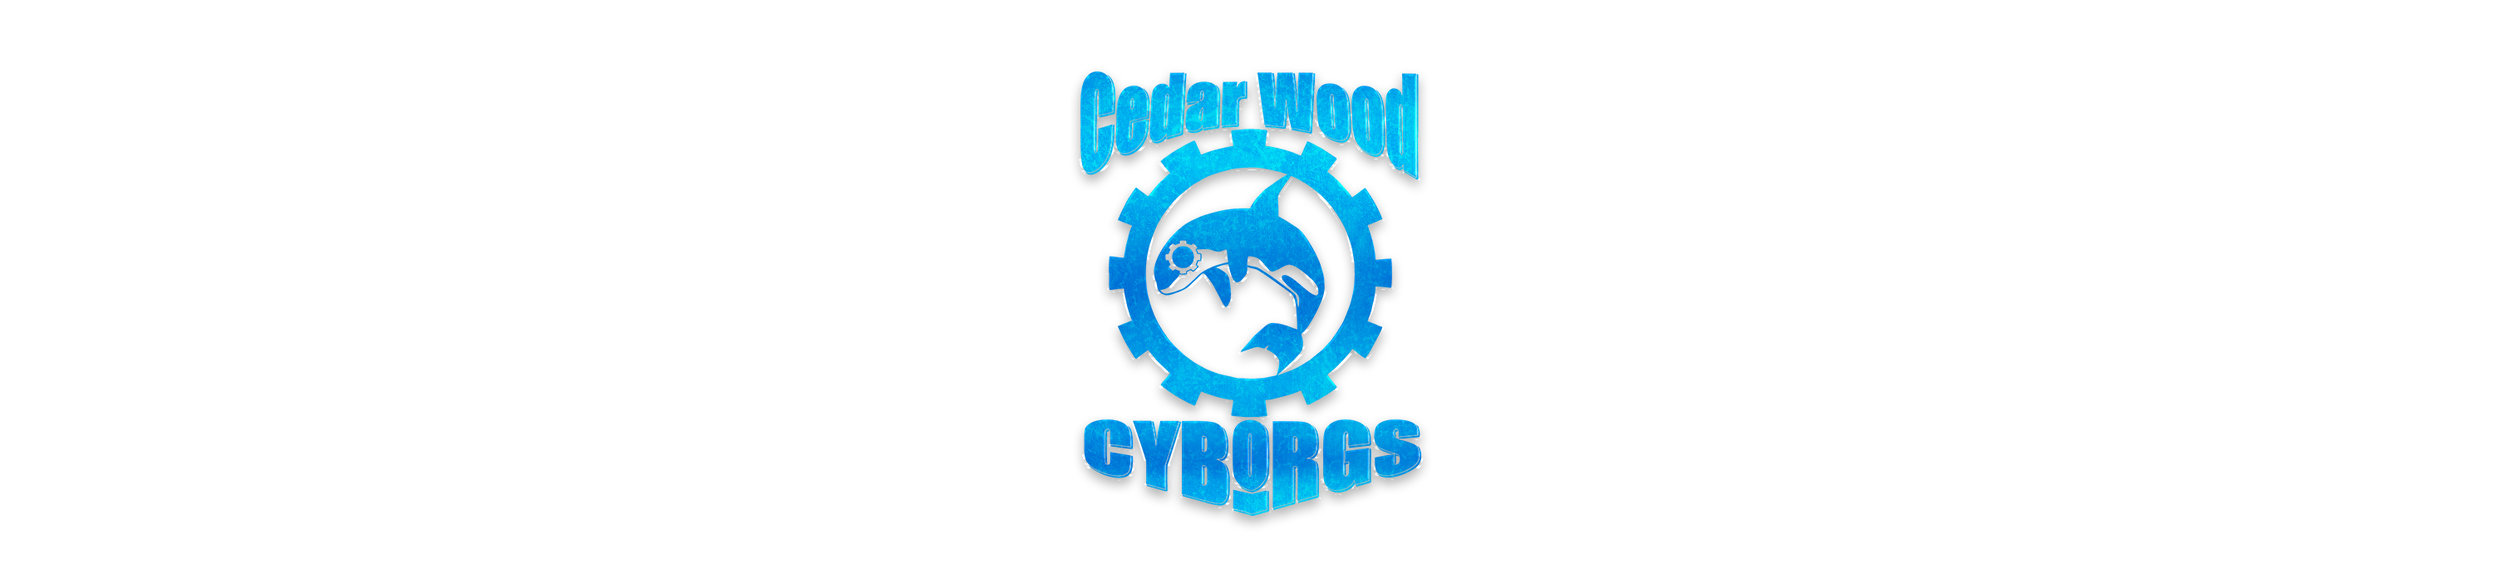 Cedarwood_Cyborgs.jpg